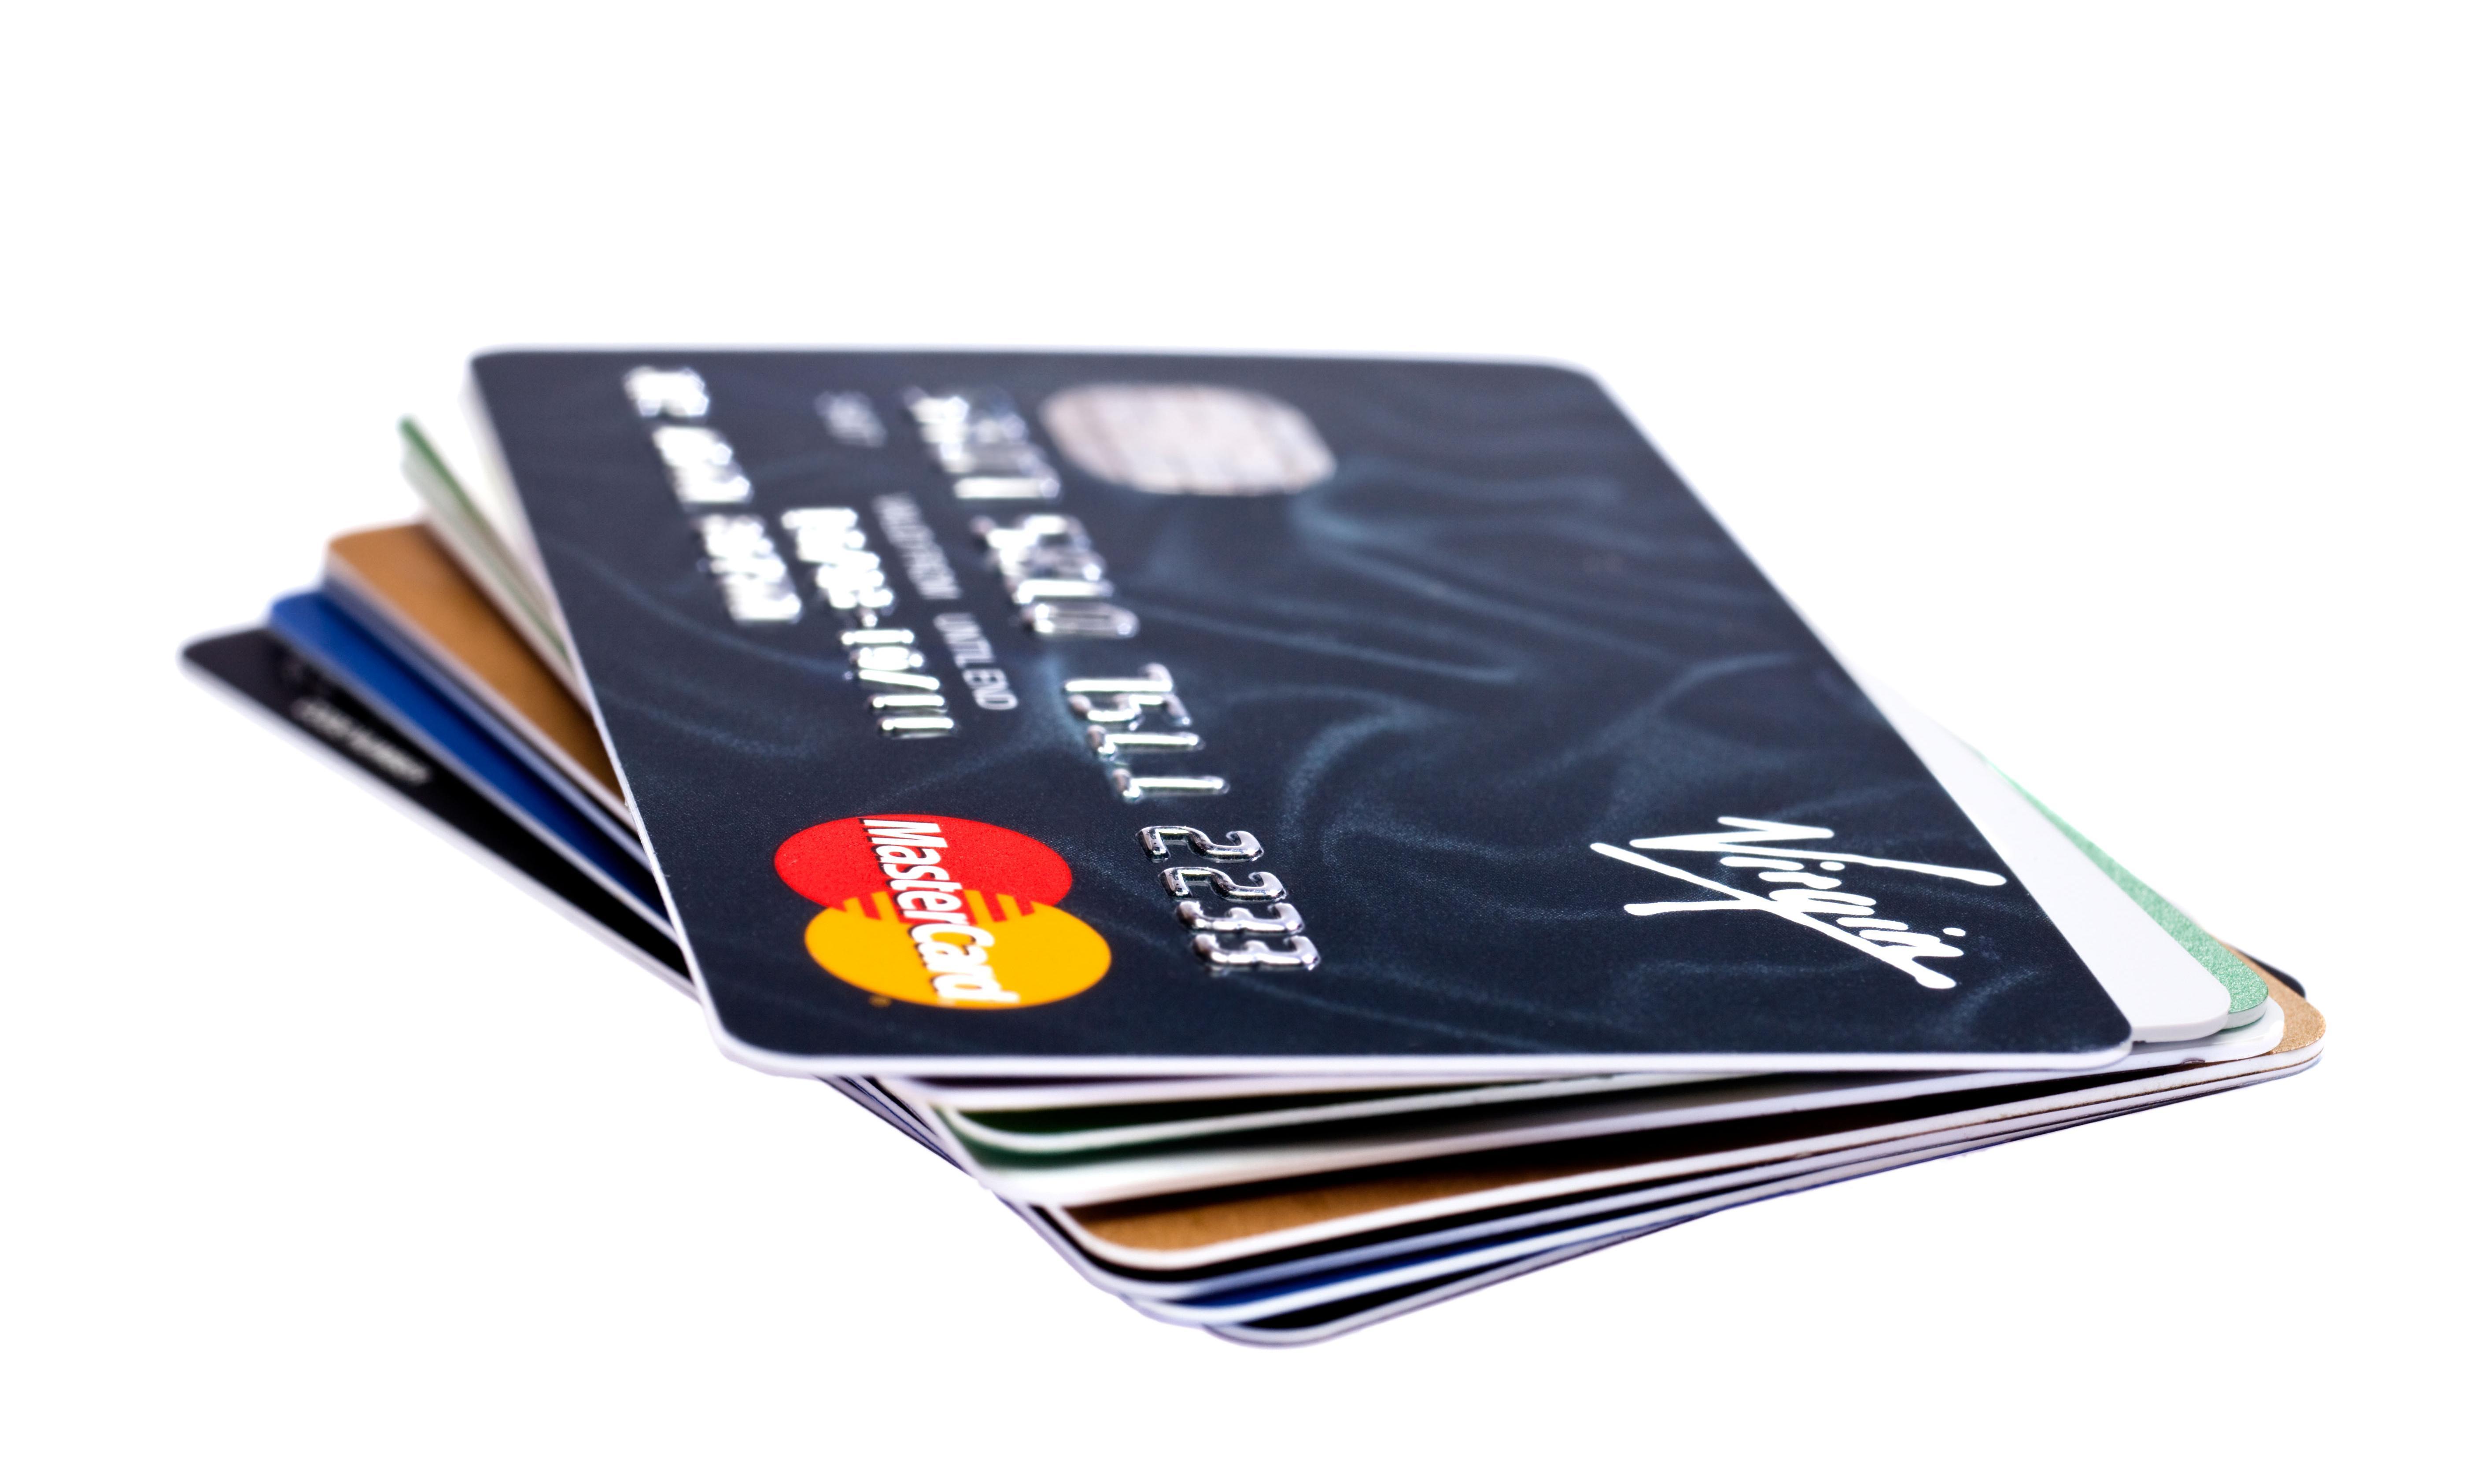 Gambling watchdog plans to ban online credit card bets